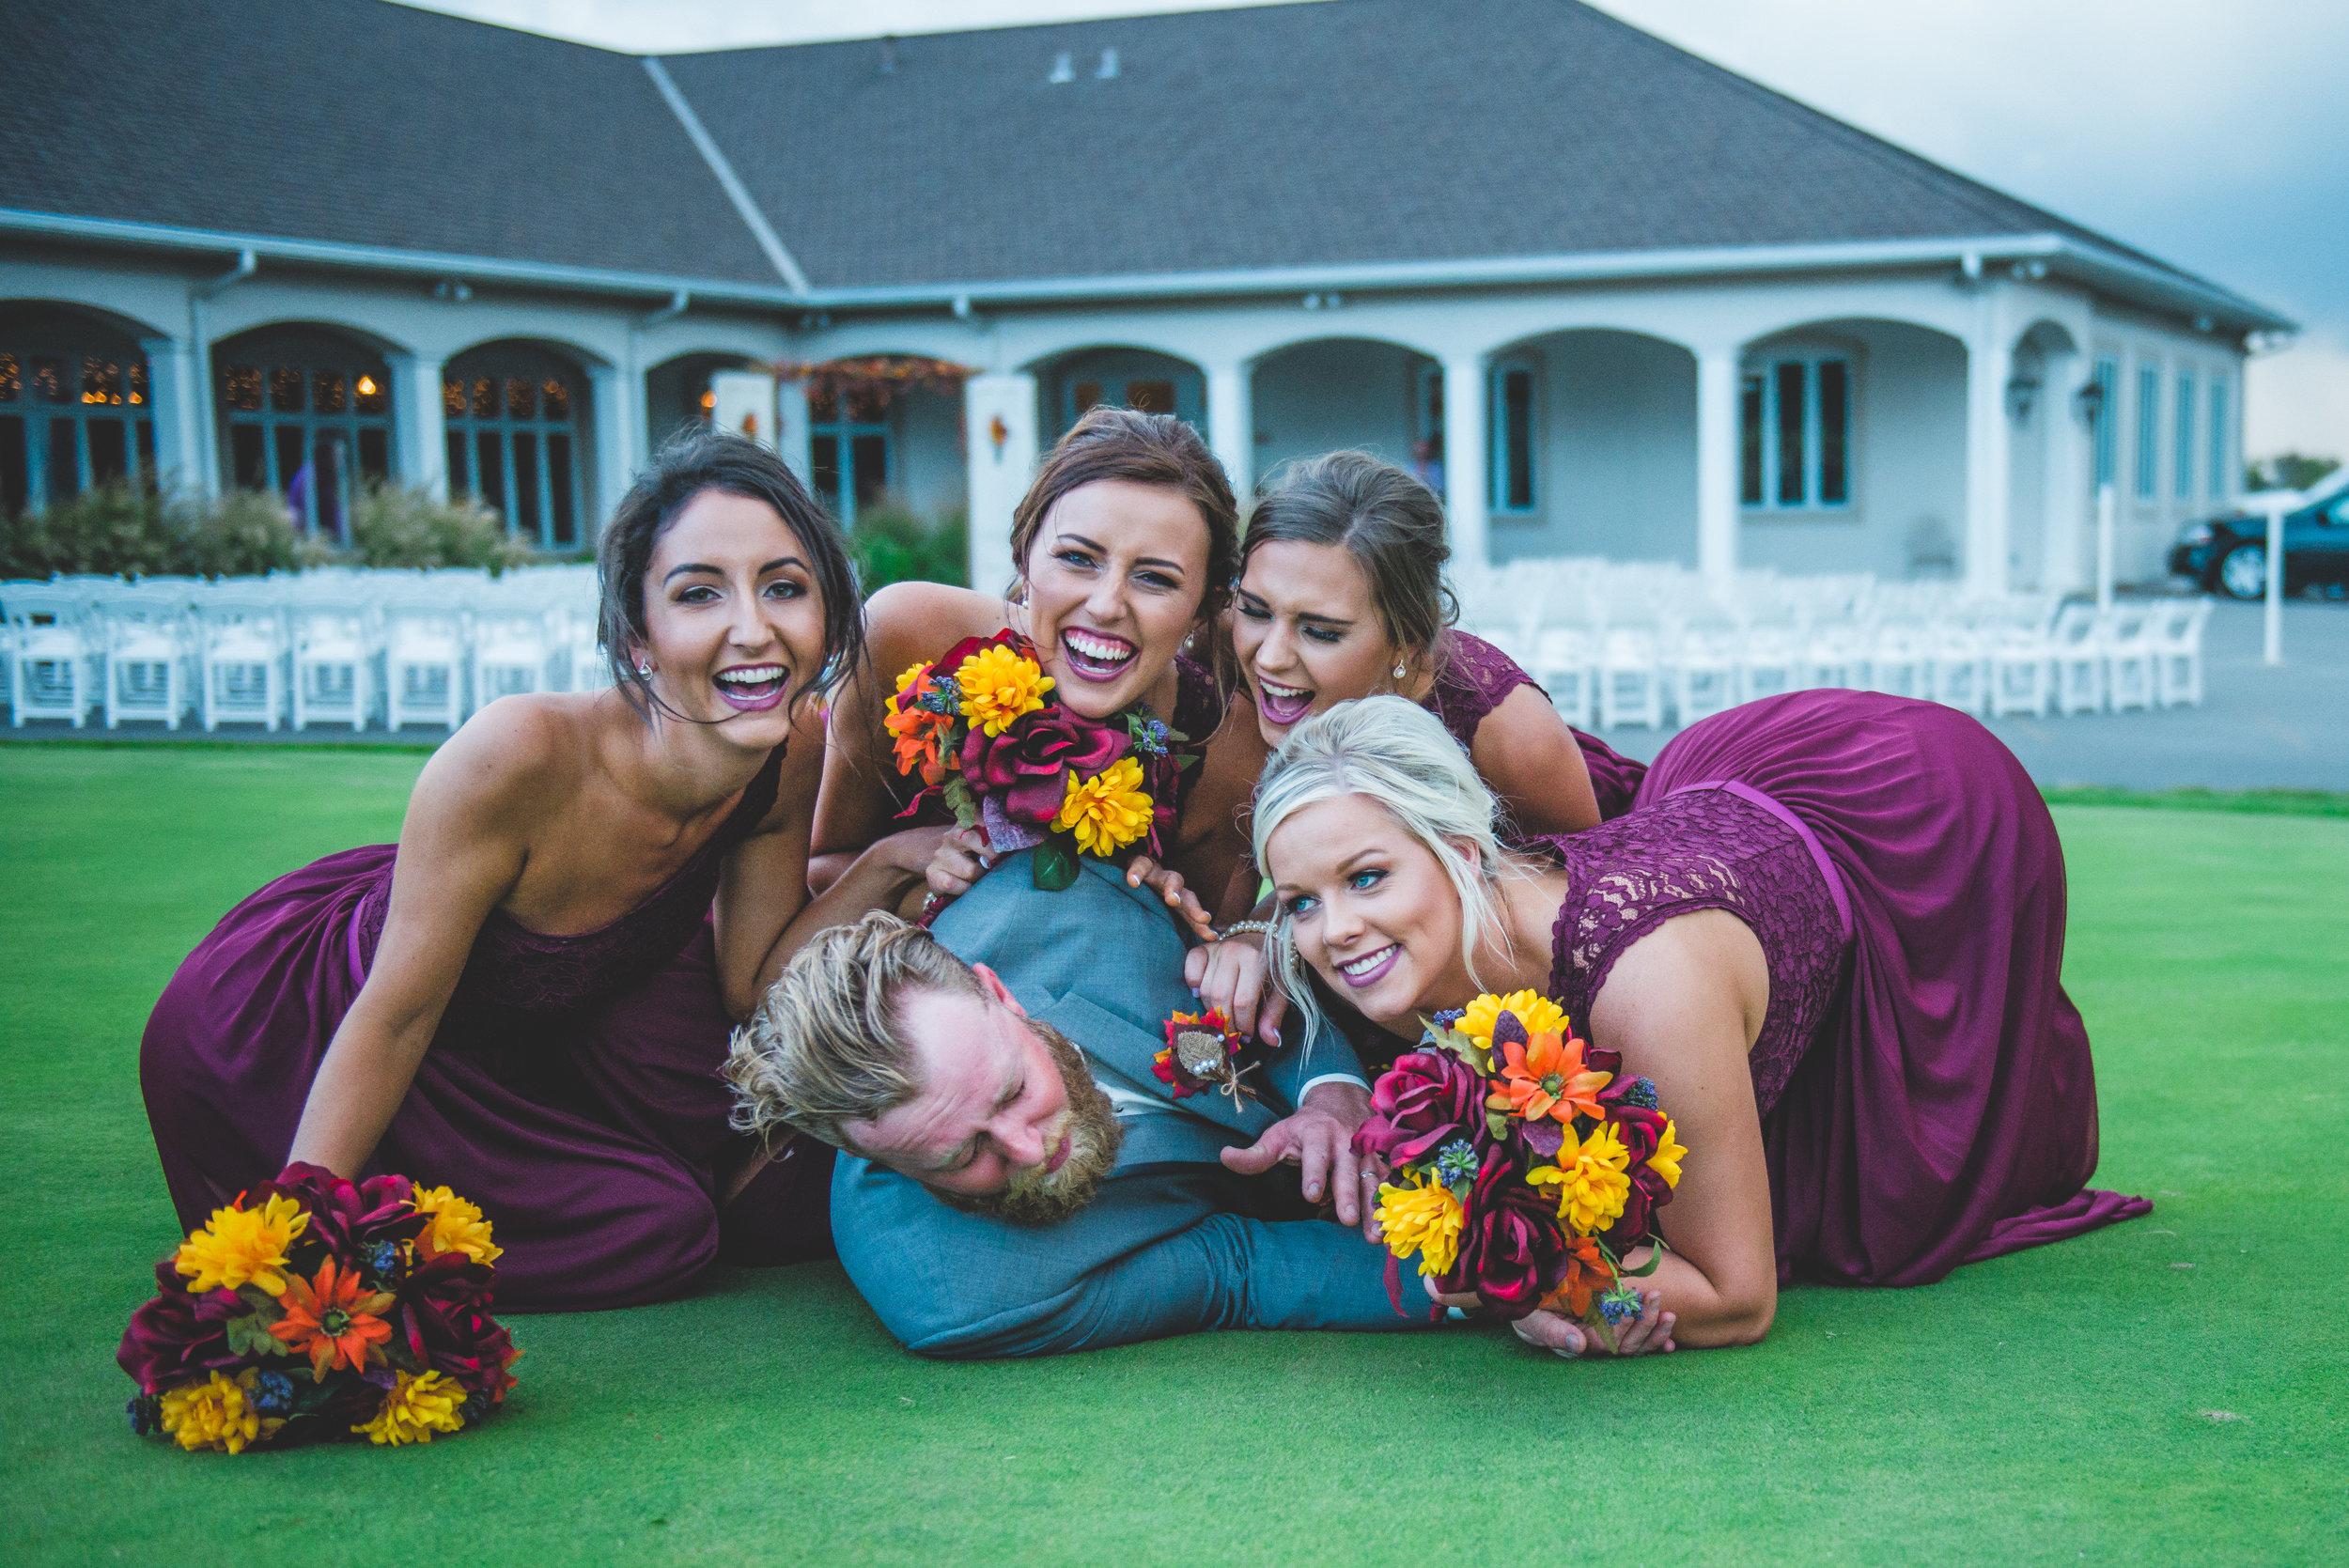 CCW - Creative Cure Weddings - Marissa and Nick - Southern Illinois Wedding Photography-7.jpg